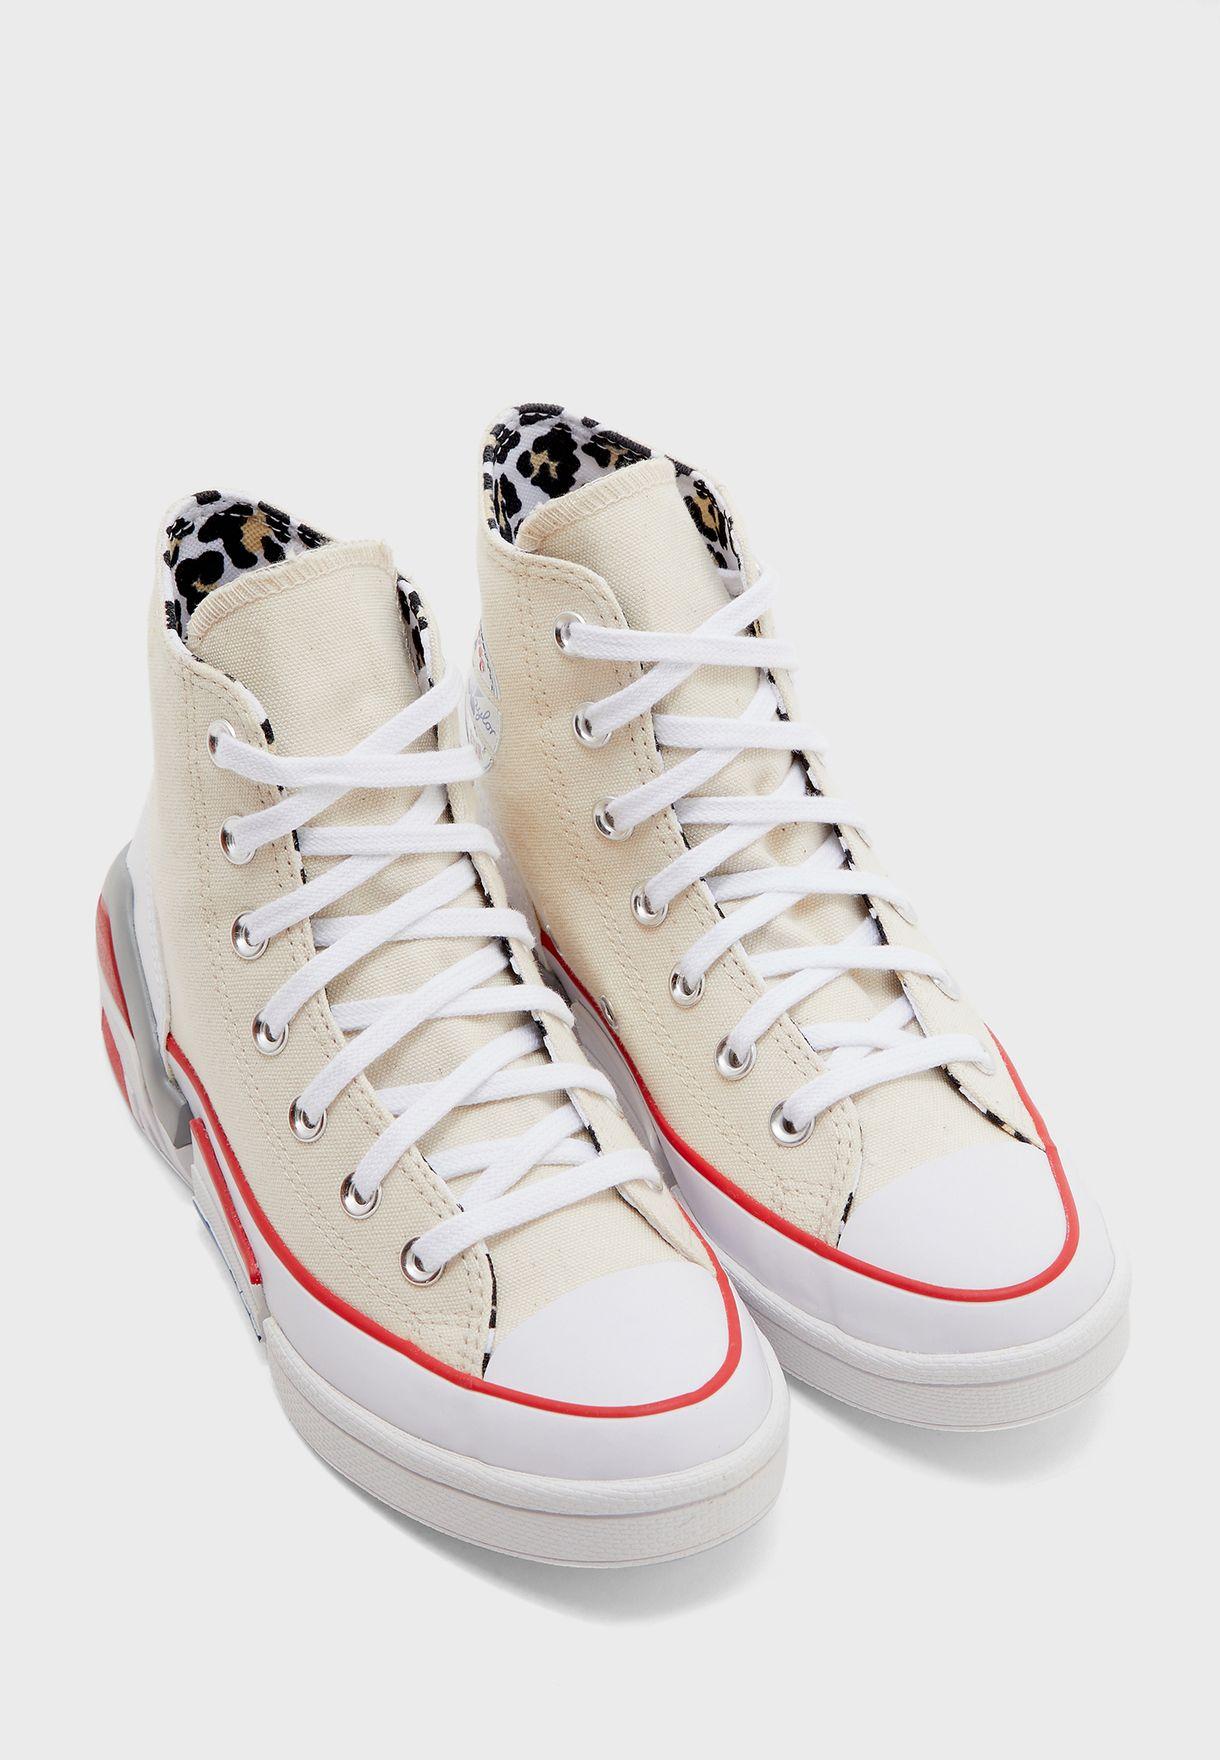 حذاء تشاك تايلور اول ستار